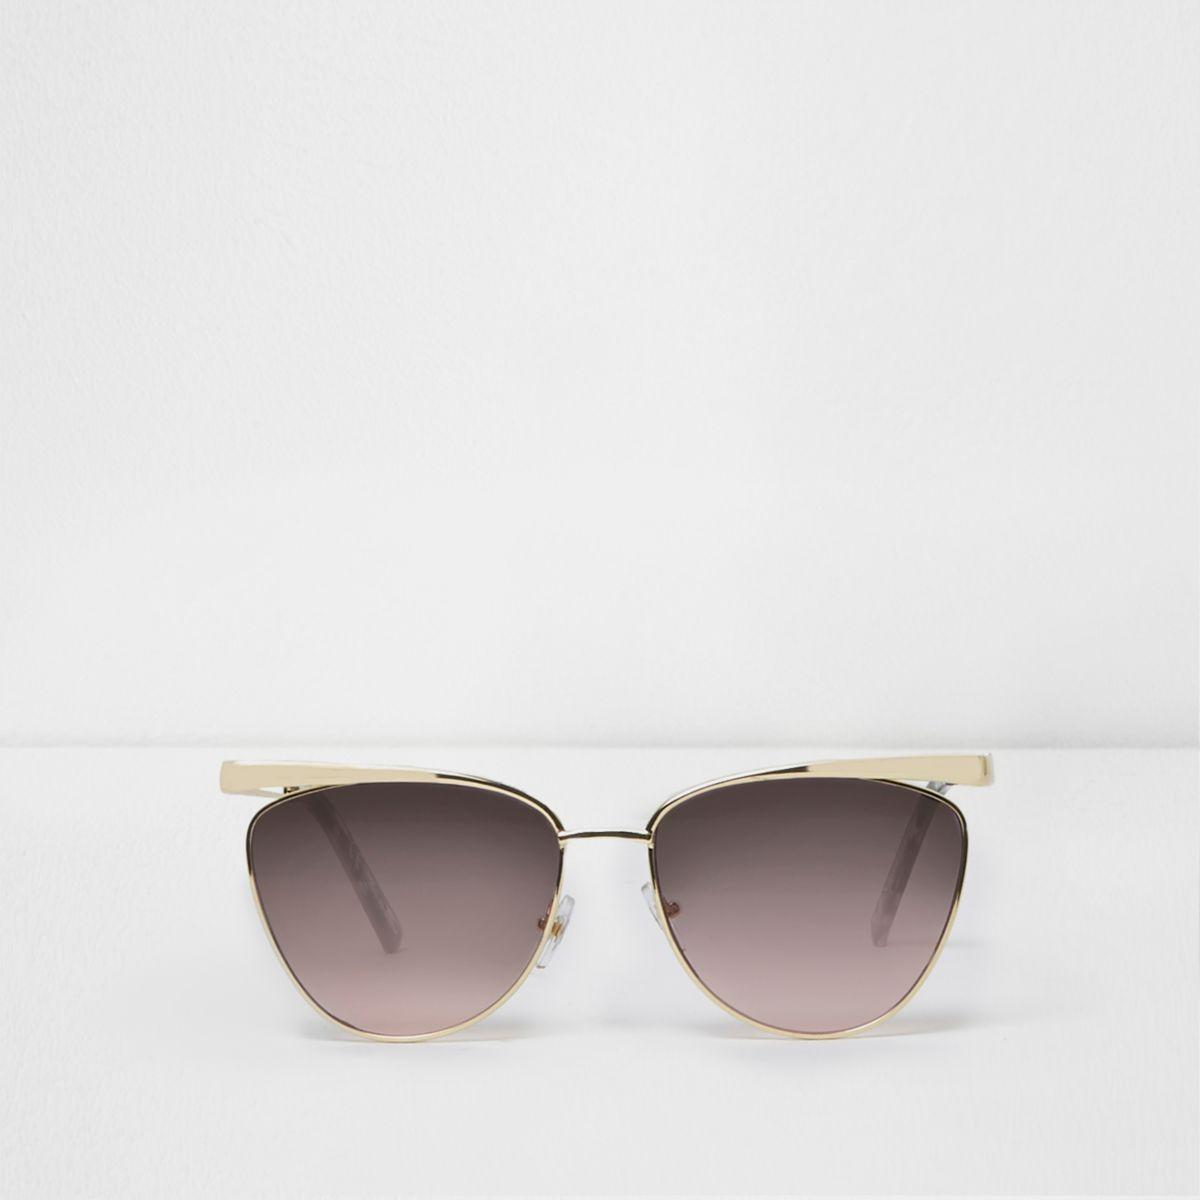 Gold tone cat eye ocean lens sunglasses